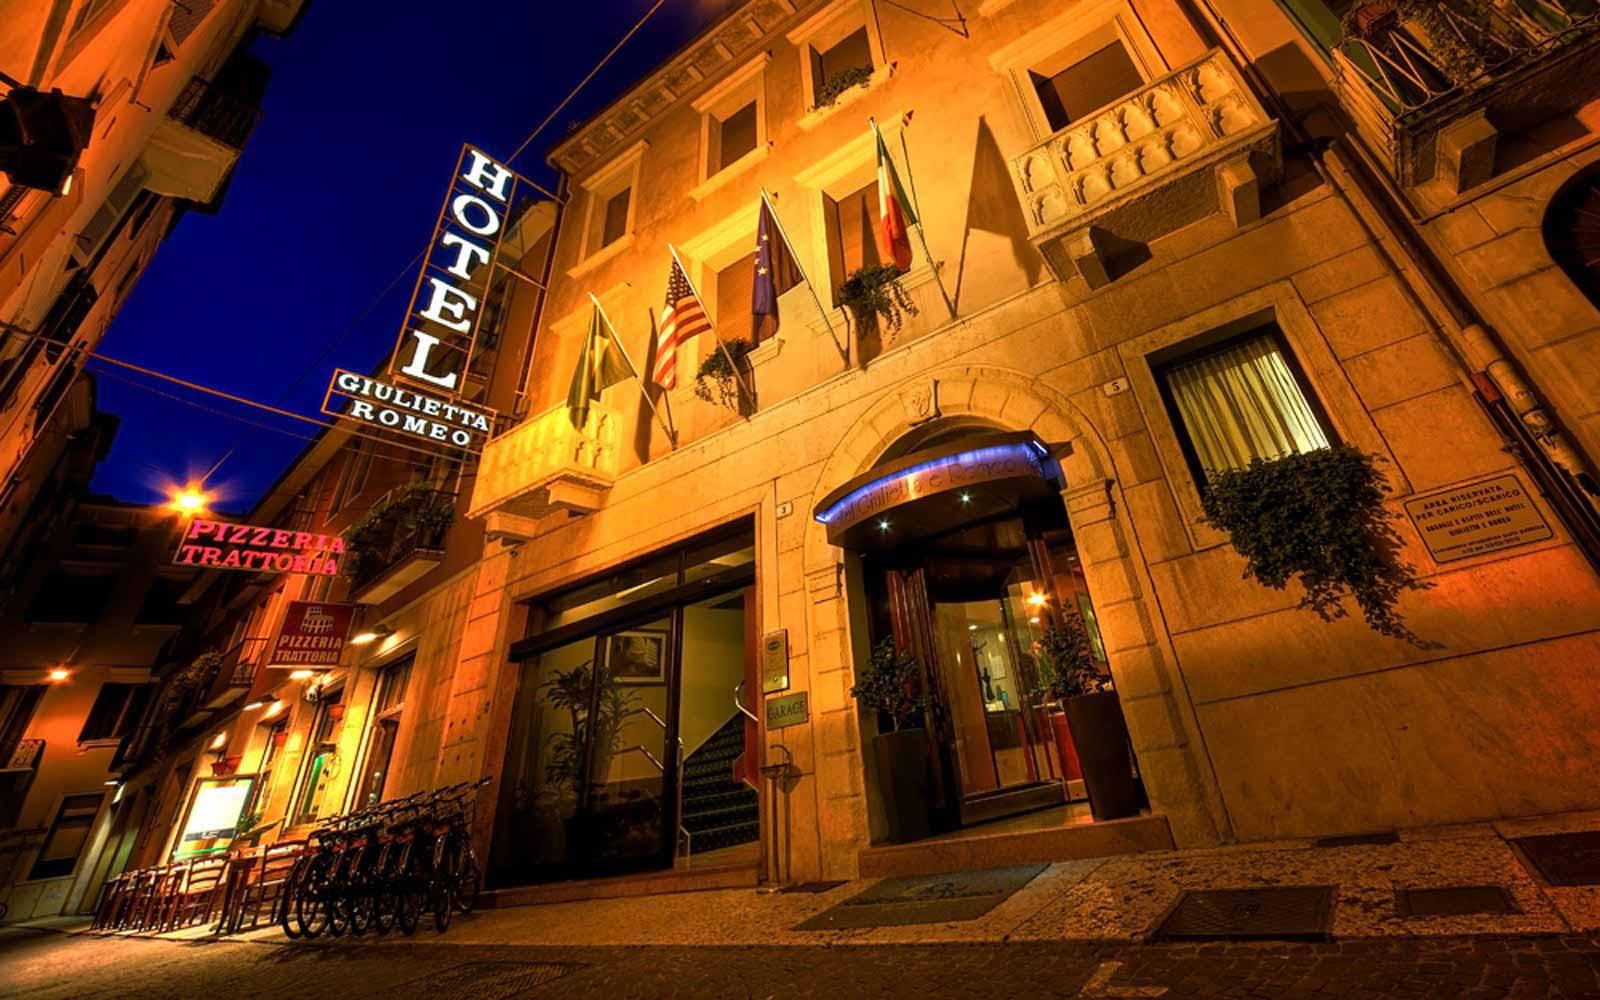 Exterior view of Hotel Giulietta & Romeo